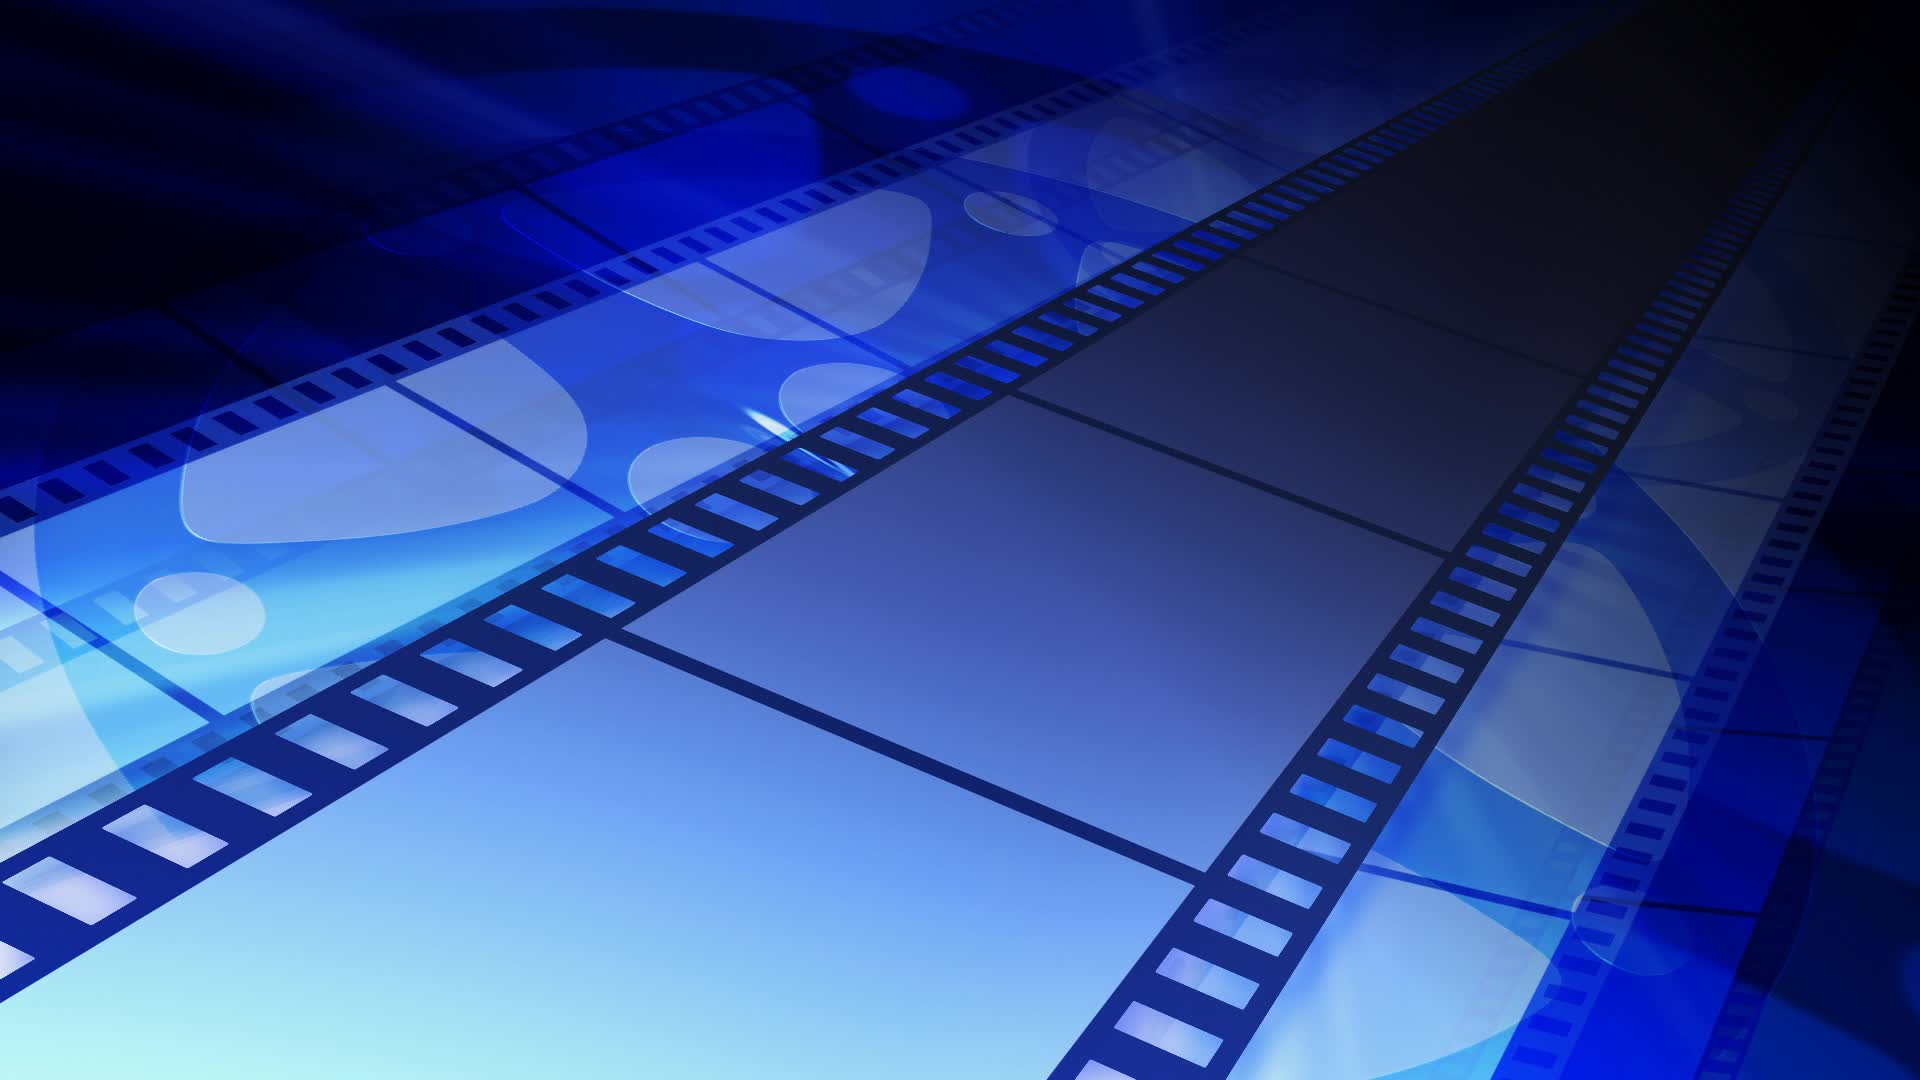 Cinema Background Stock Video 24725417 | HD Stock Footage